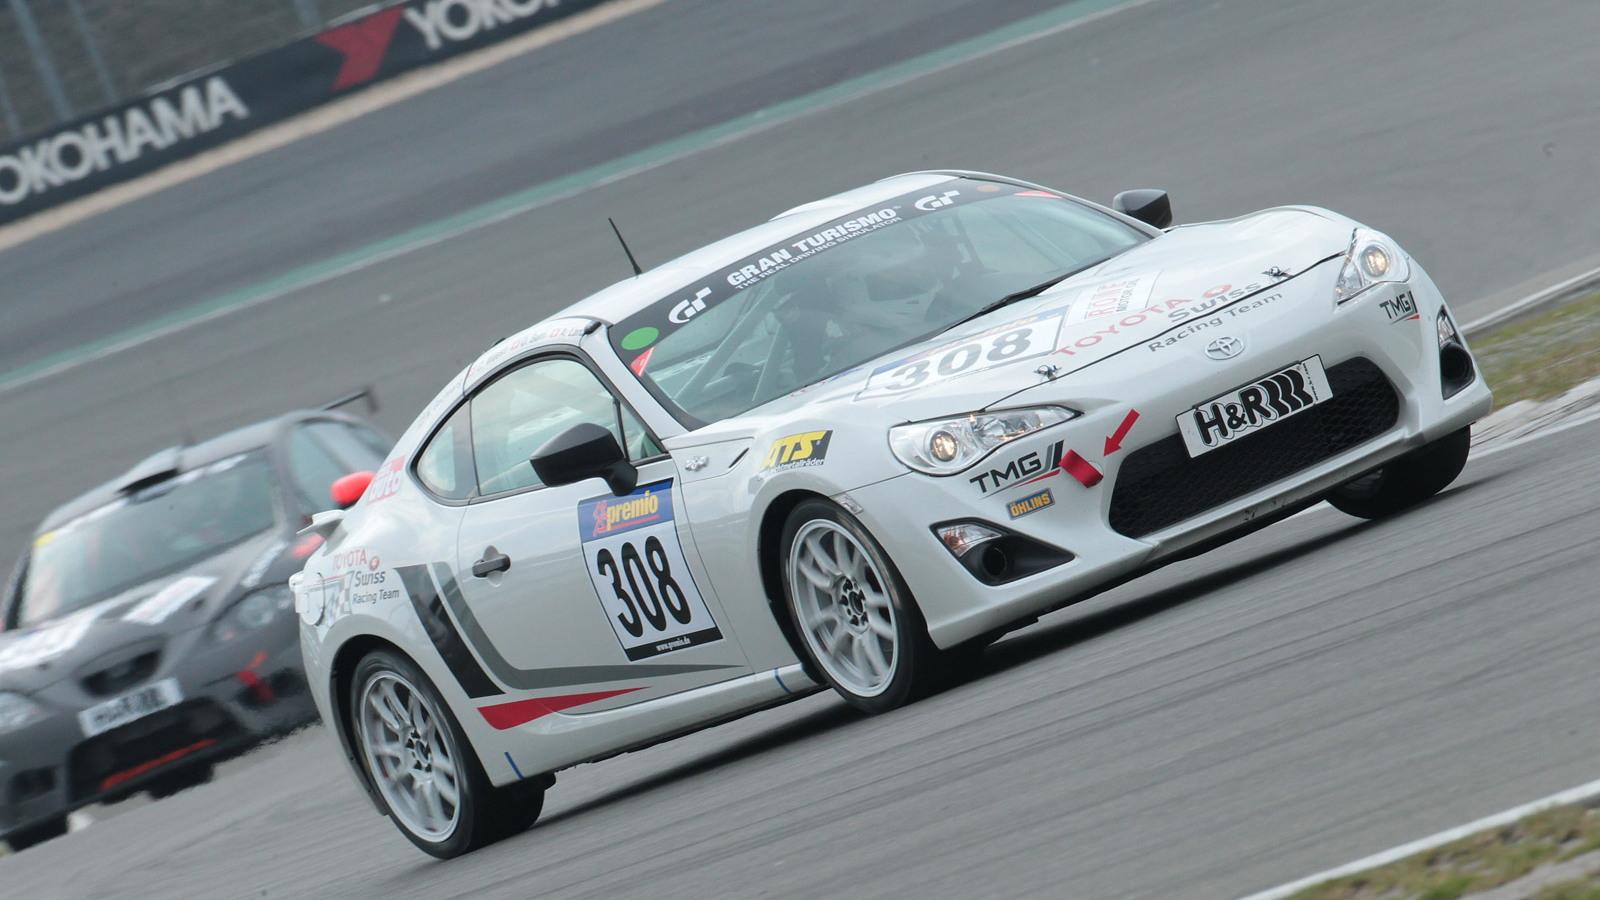 Toyota GT 86 CS-V3 race car built by Toyota Motorsport GmbH